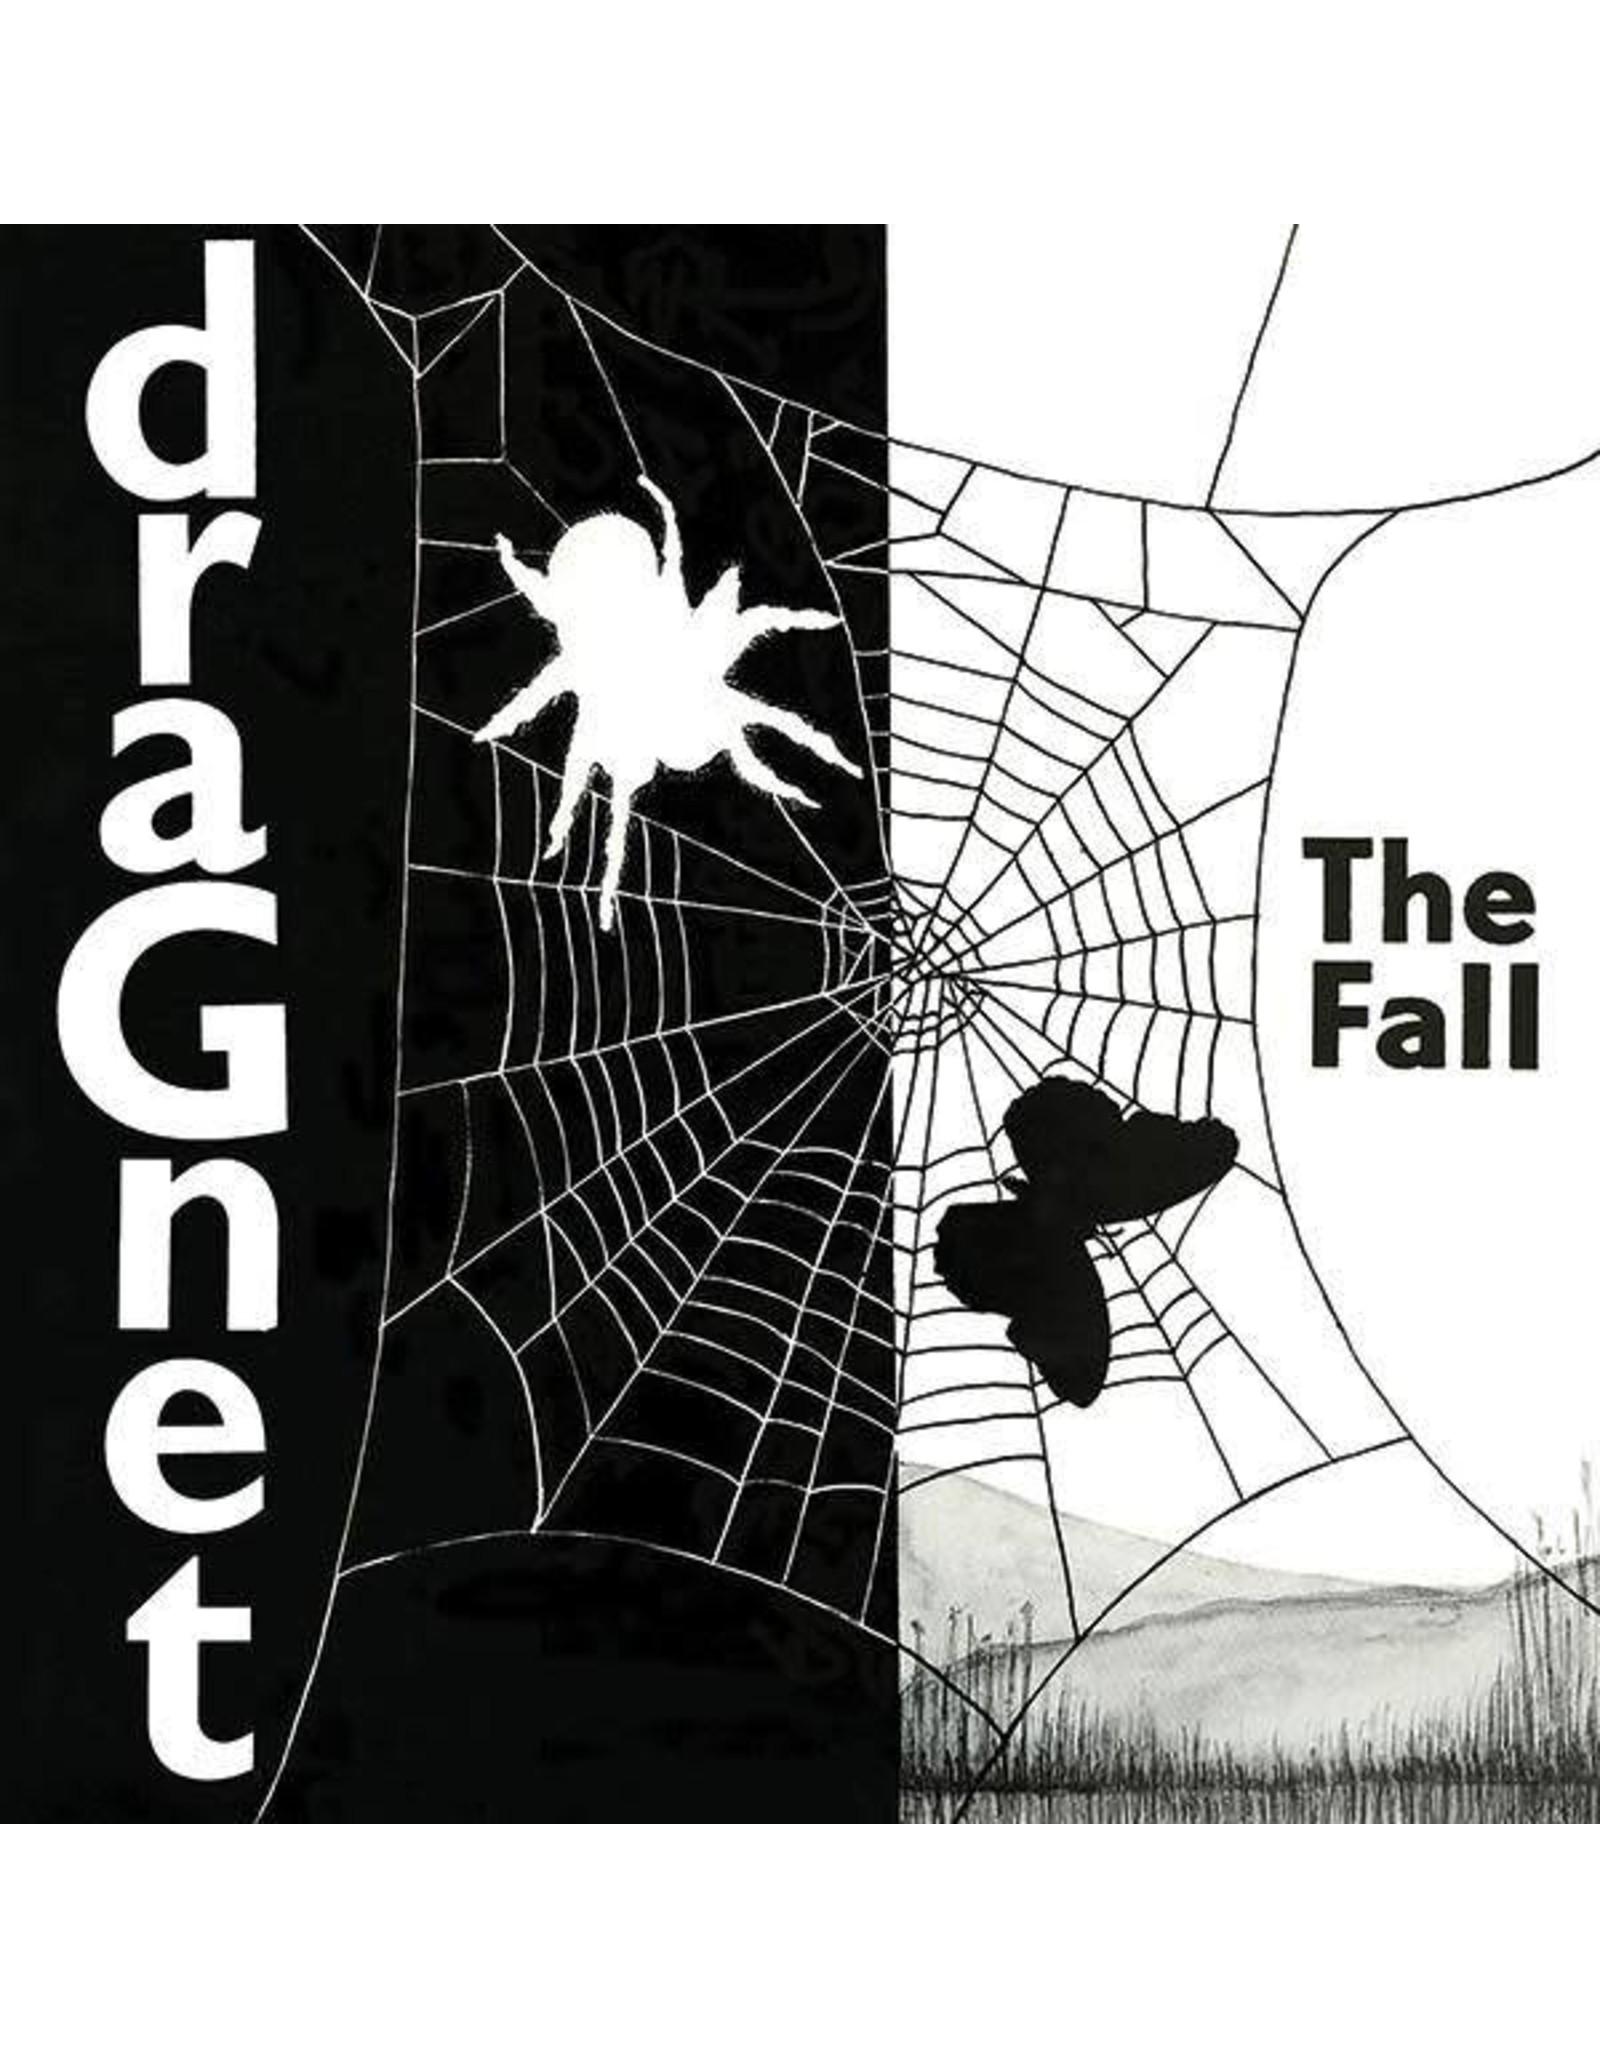 Superior Viaduct Fall: Dragnet LP